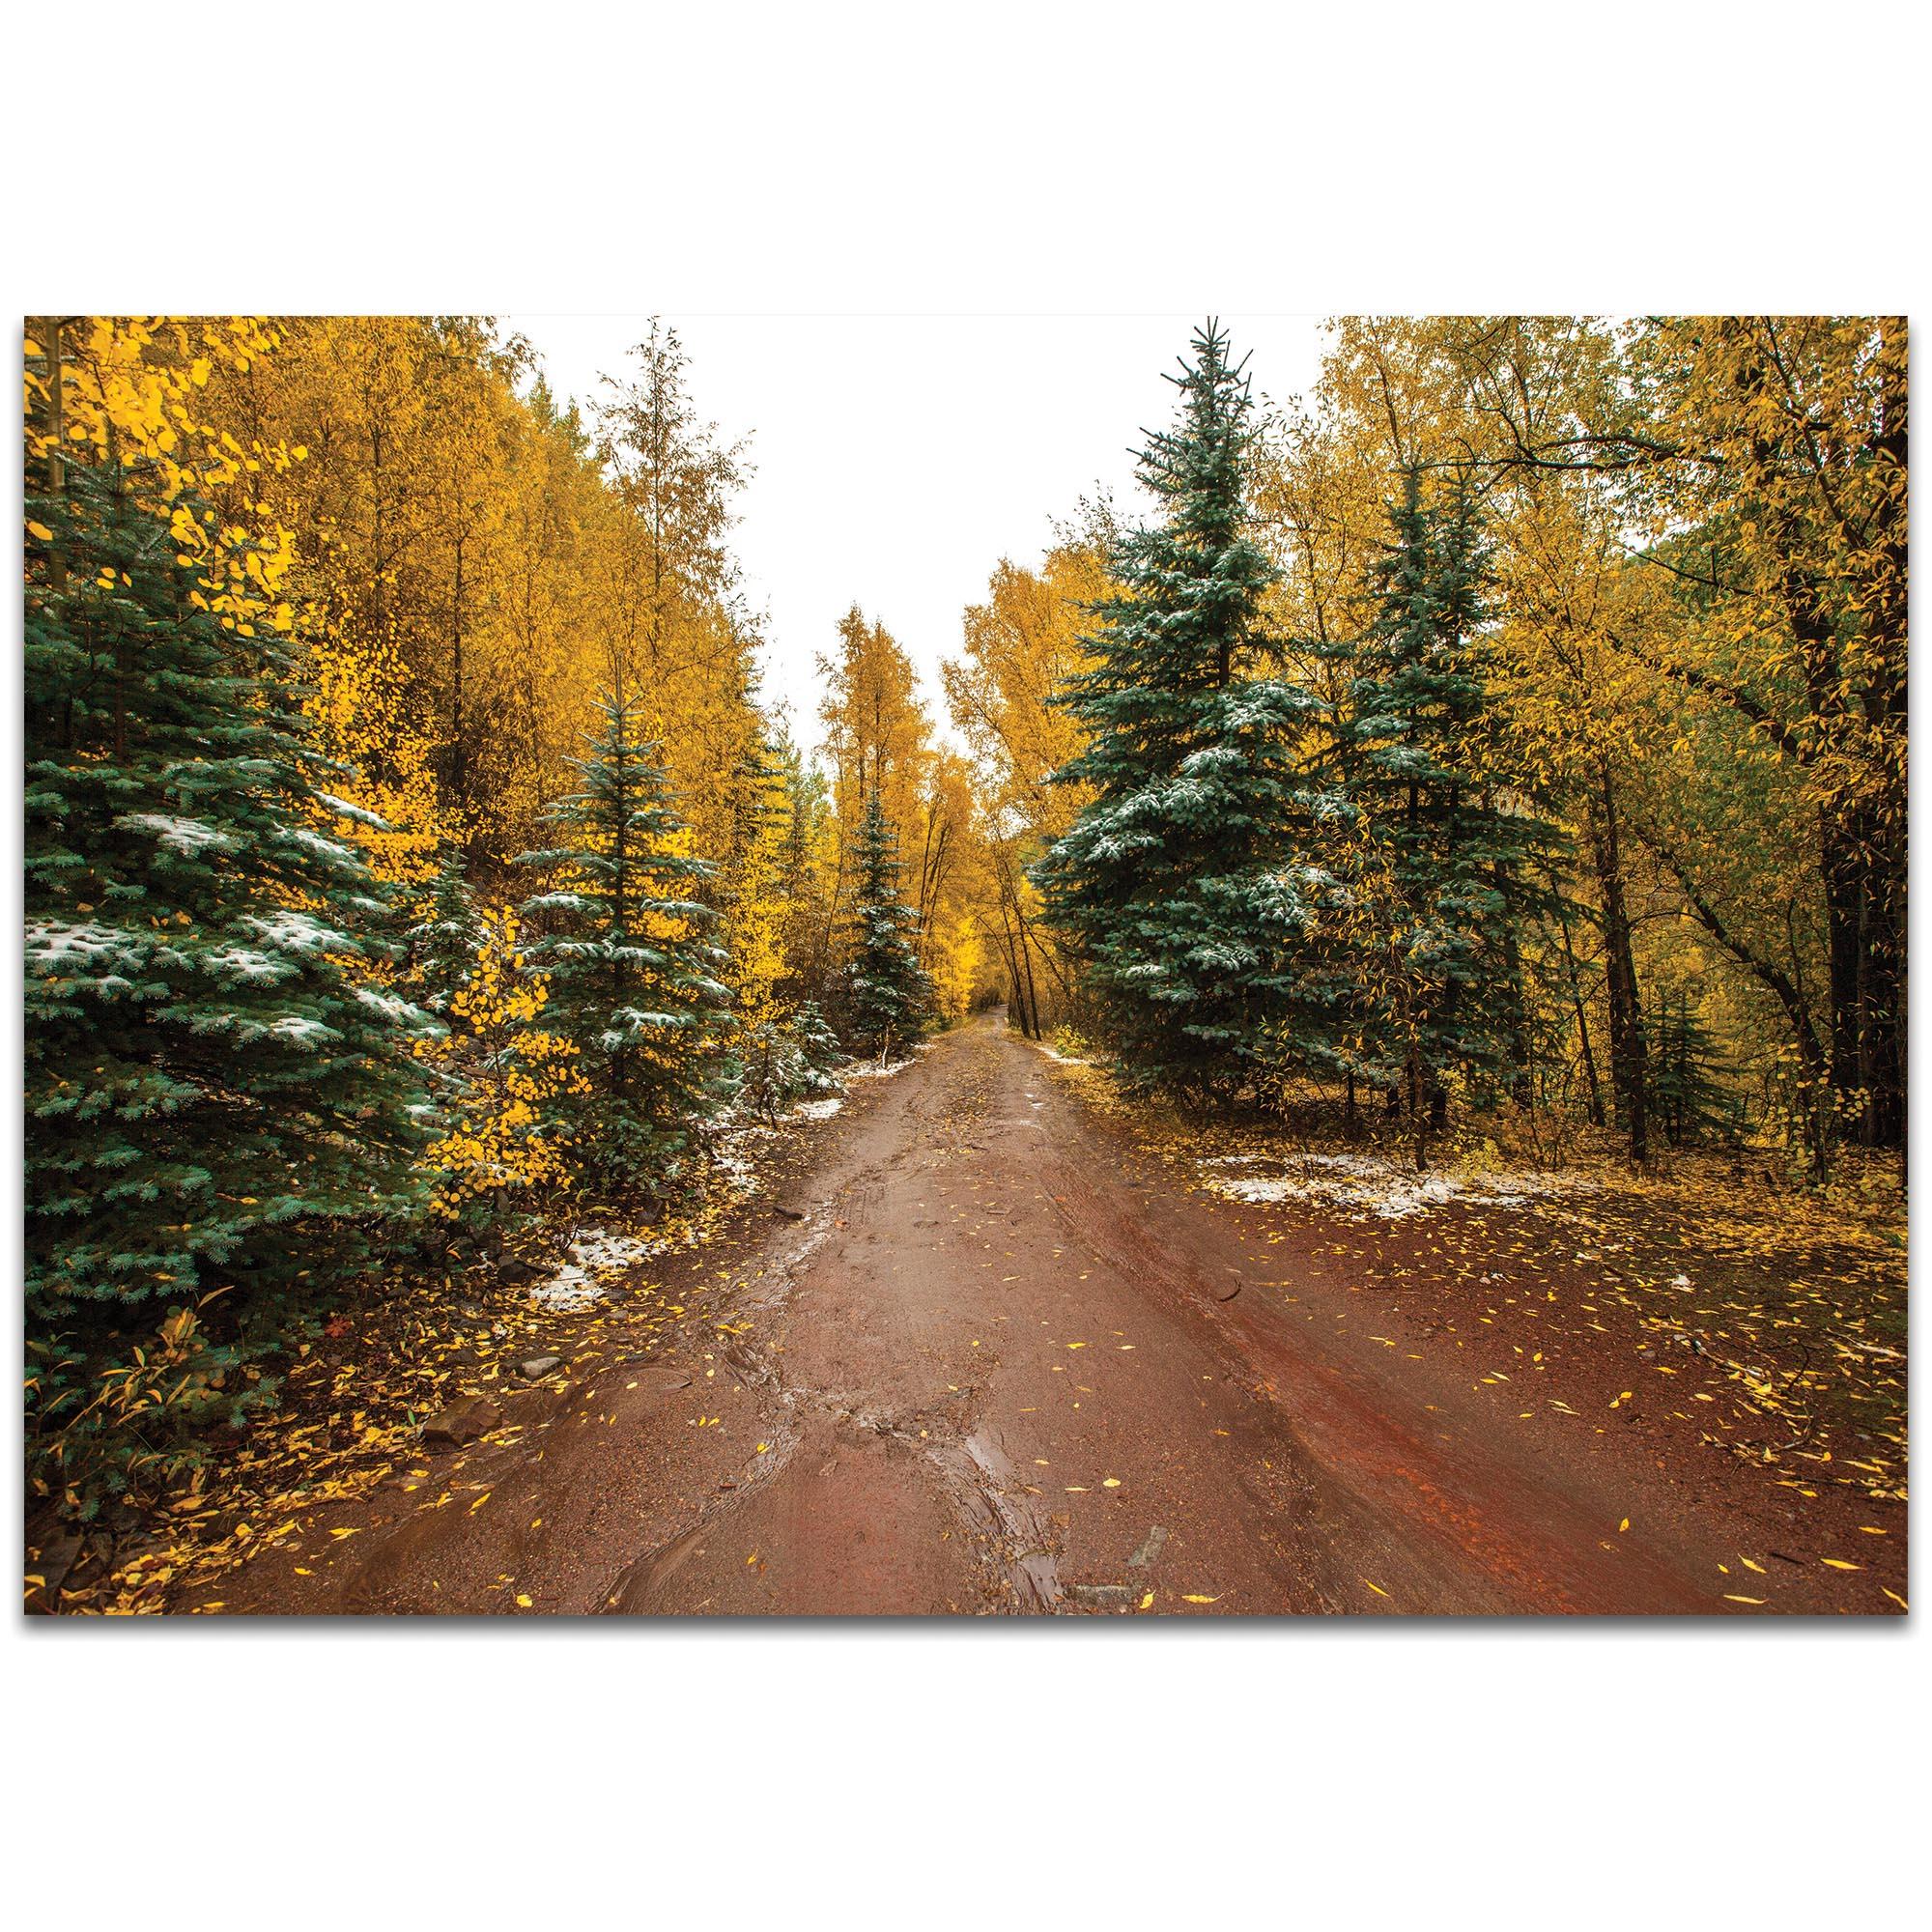 Landscape Photography 'Road Less Traveled' - Autumn Trees Art on Metal or Plexiglass